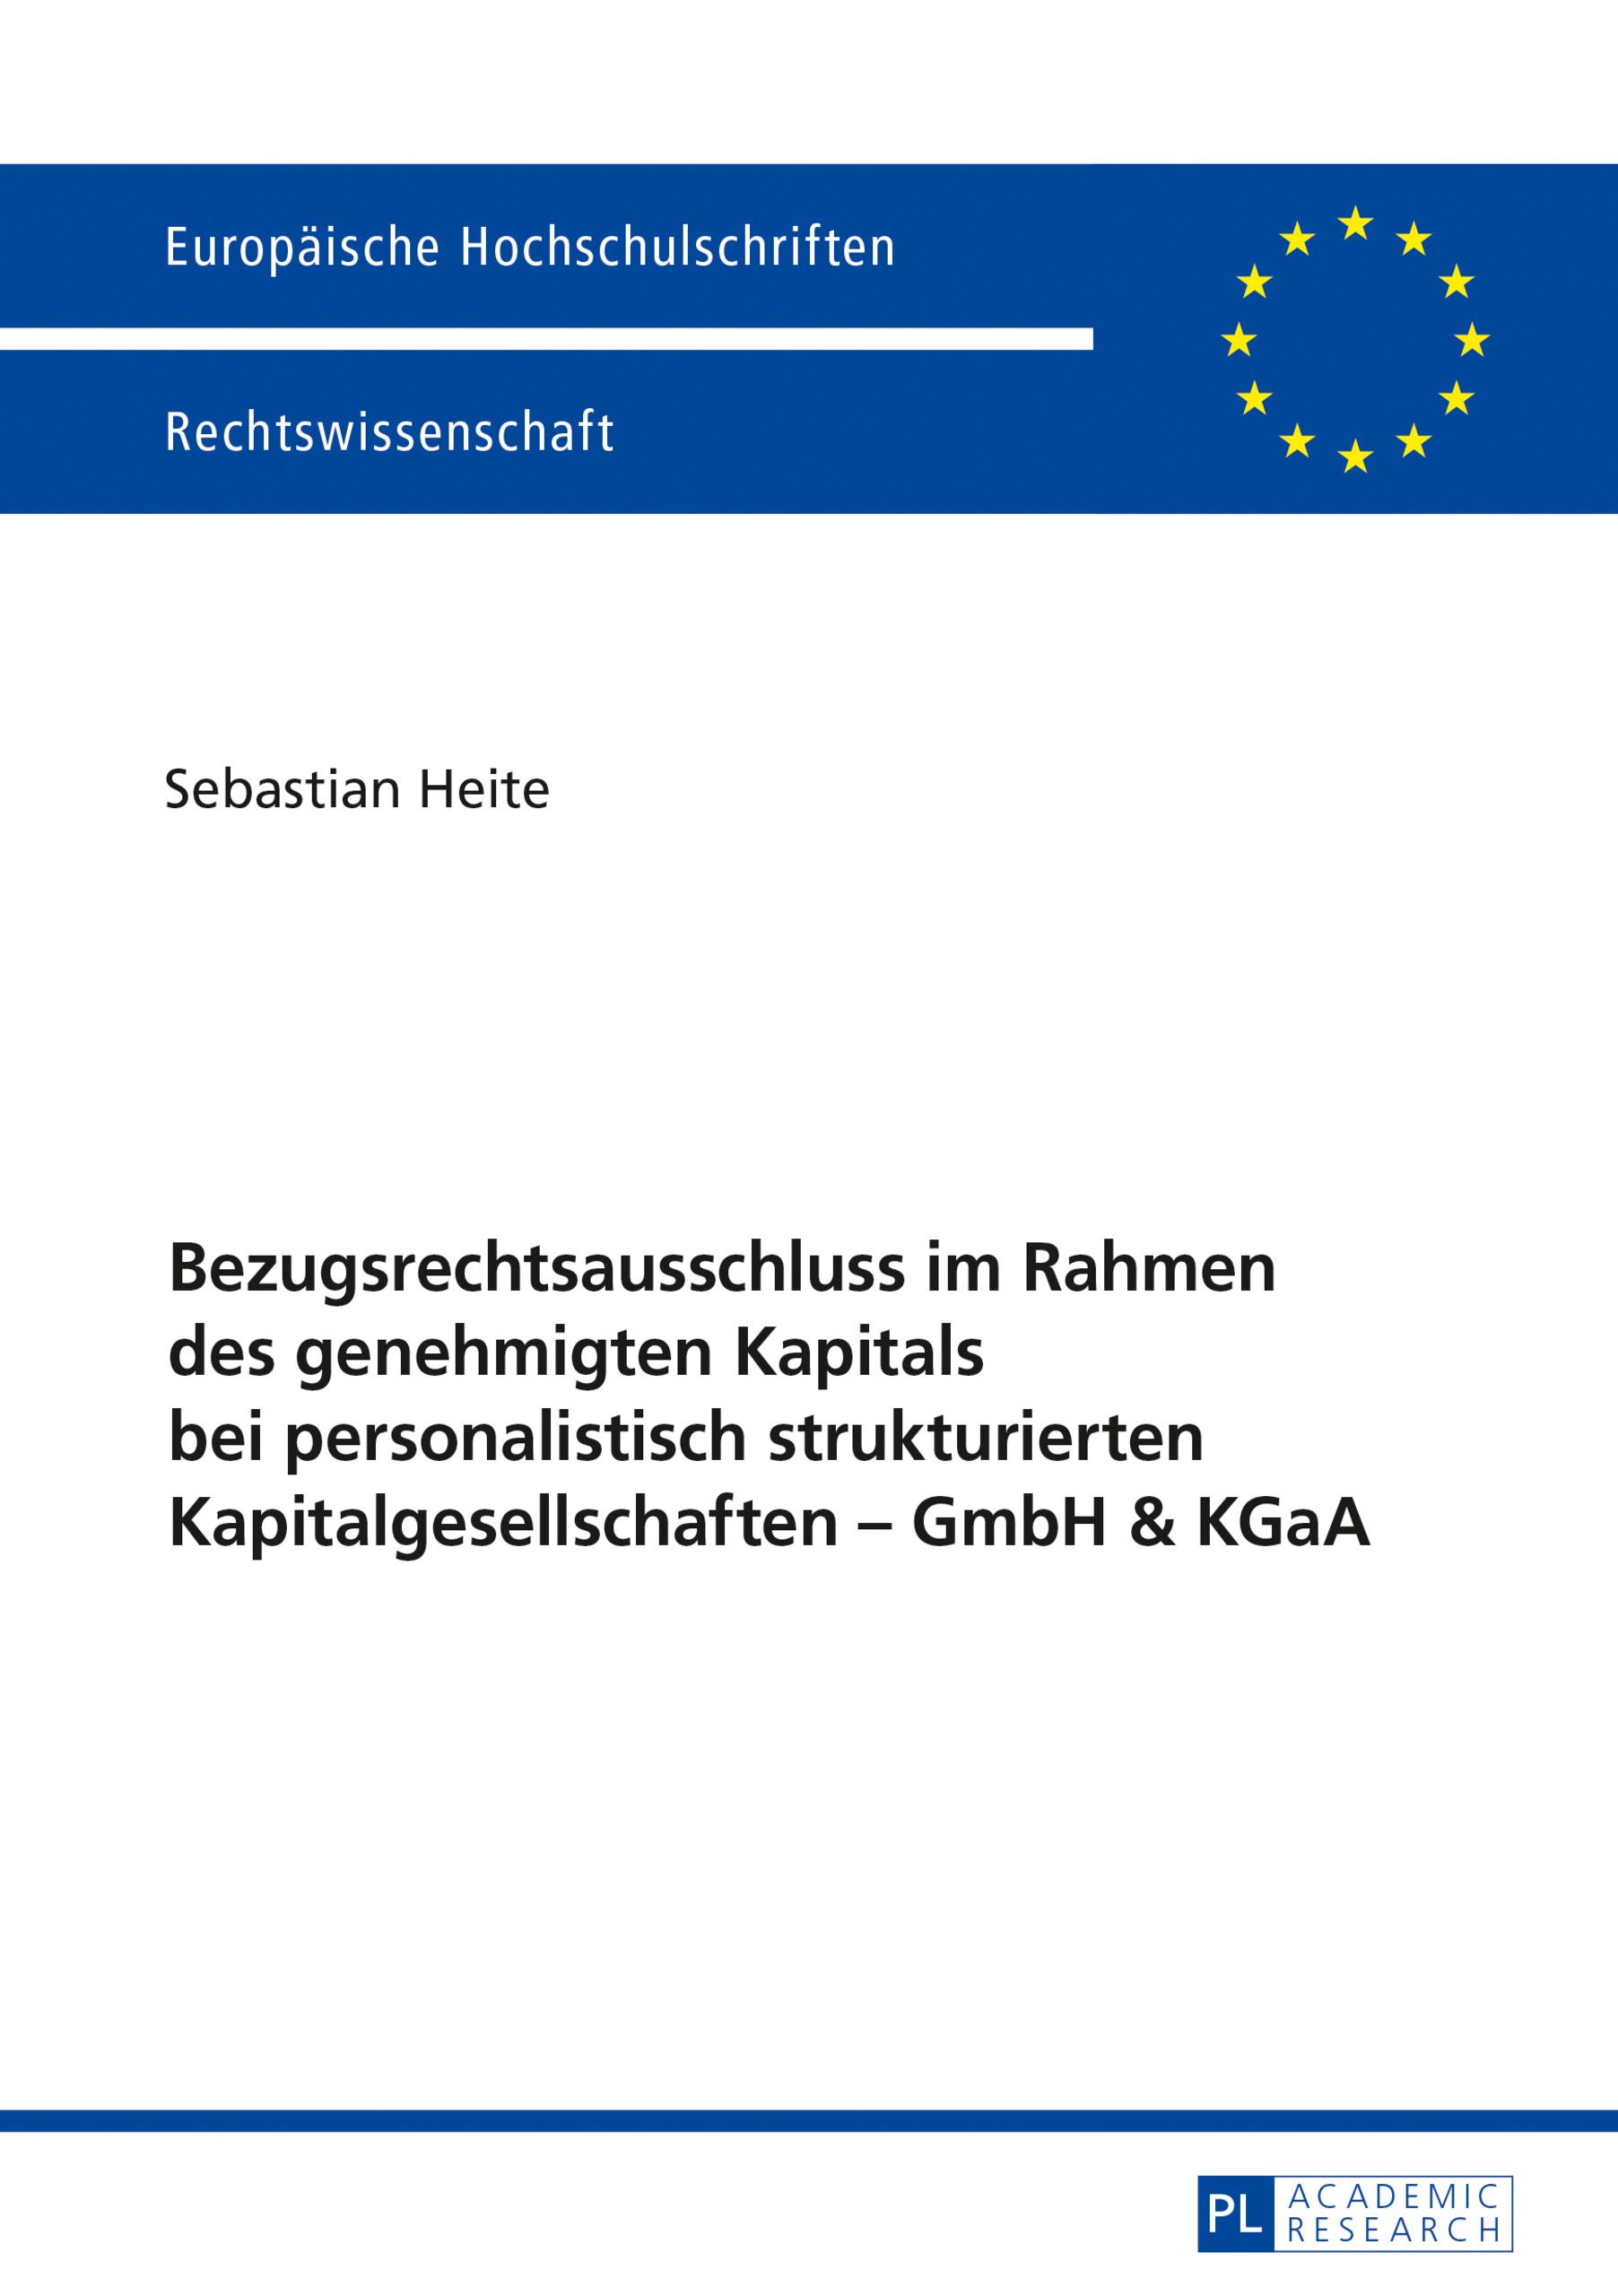 Gemütlich Basman Rahmen Zum Verkauf Ideen - Bilderrahmen Ideen ...